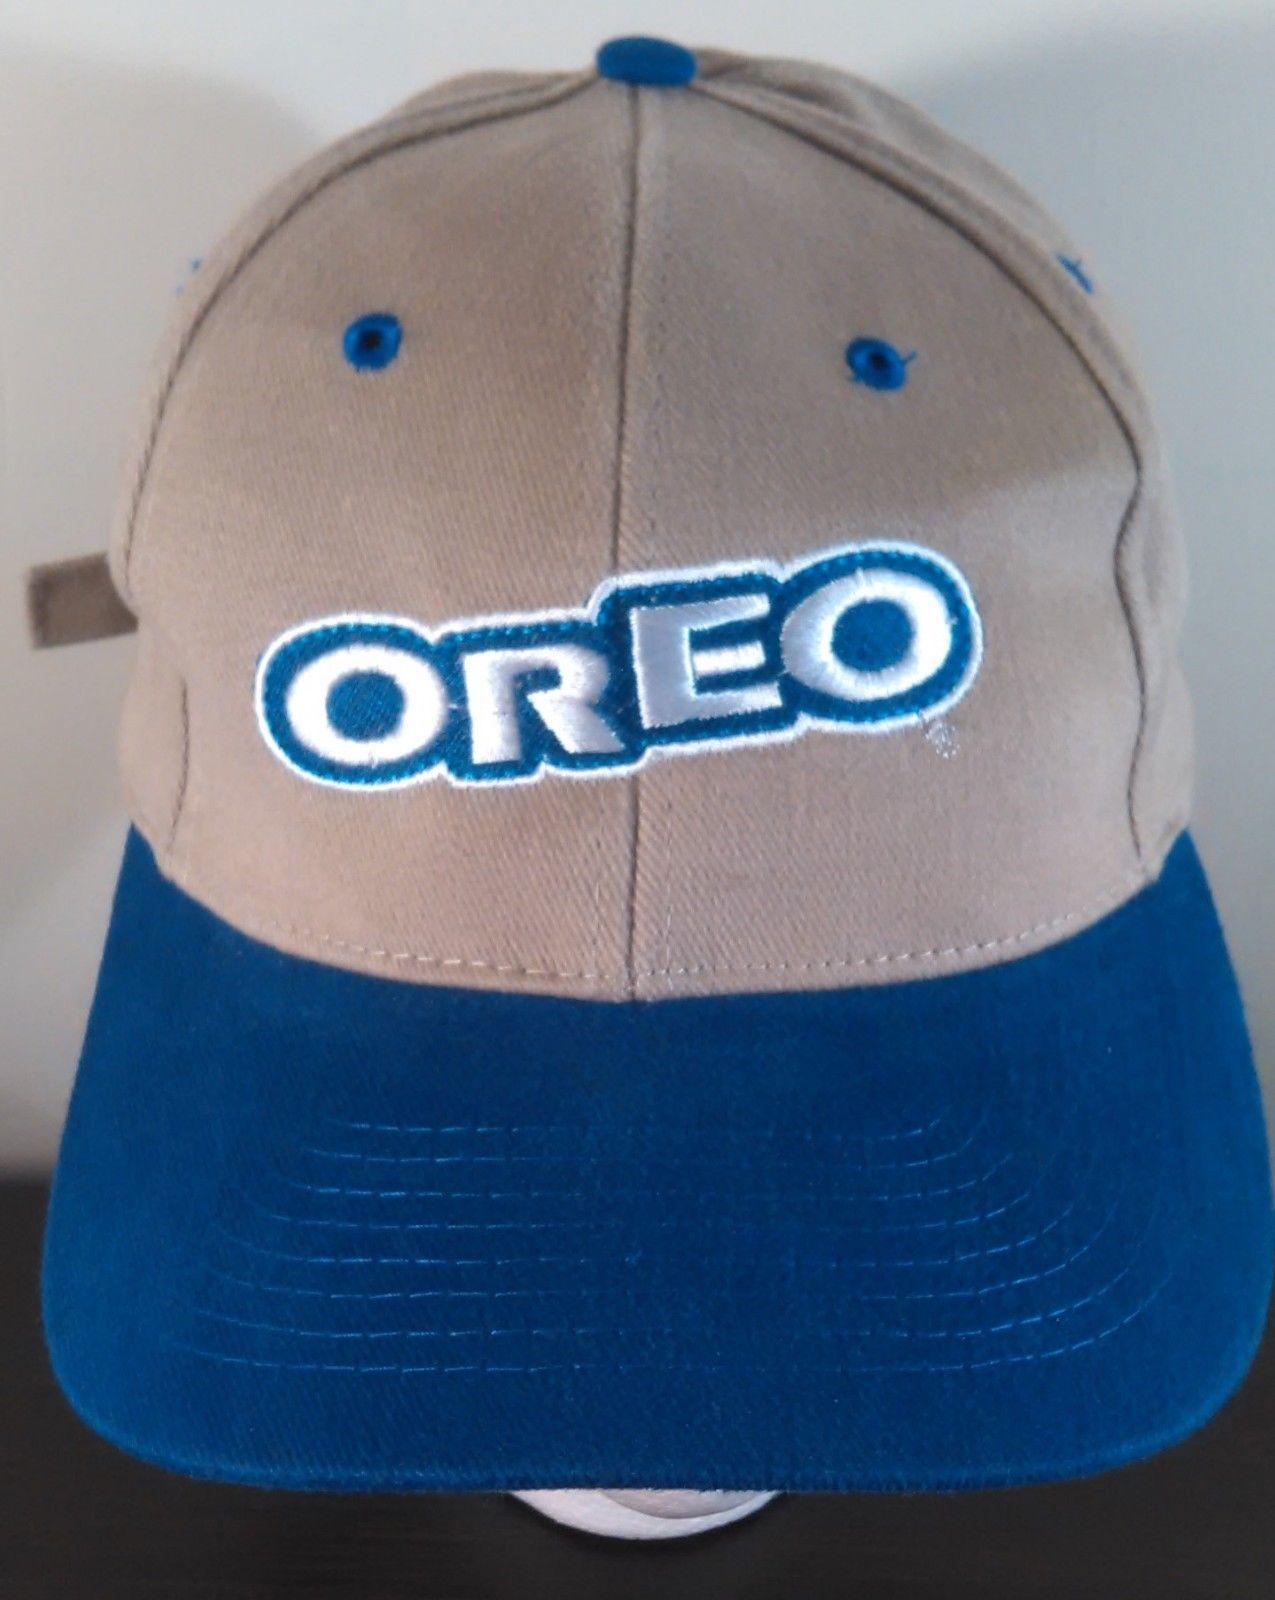 ae1b71b85e5f0 Vintage Embroidered OREO Baseball Hat NISSIN Cap Clamp Back Blue Tan Soft  Nascar